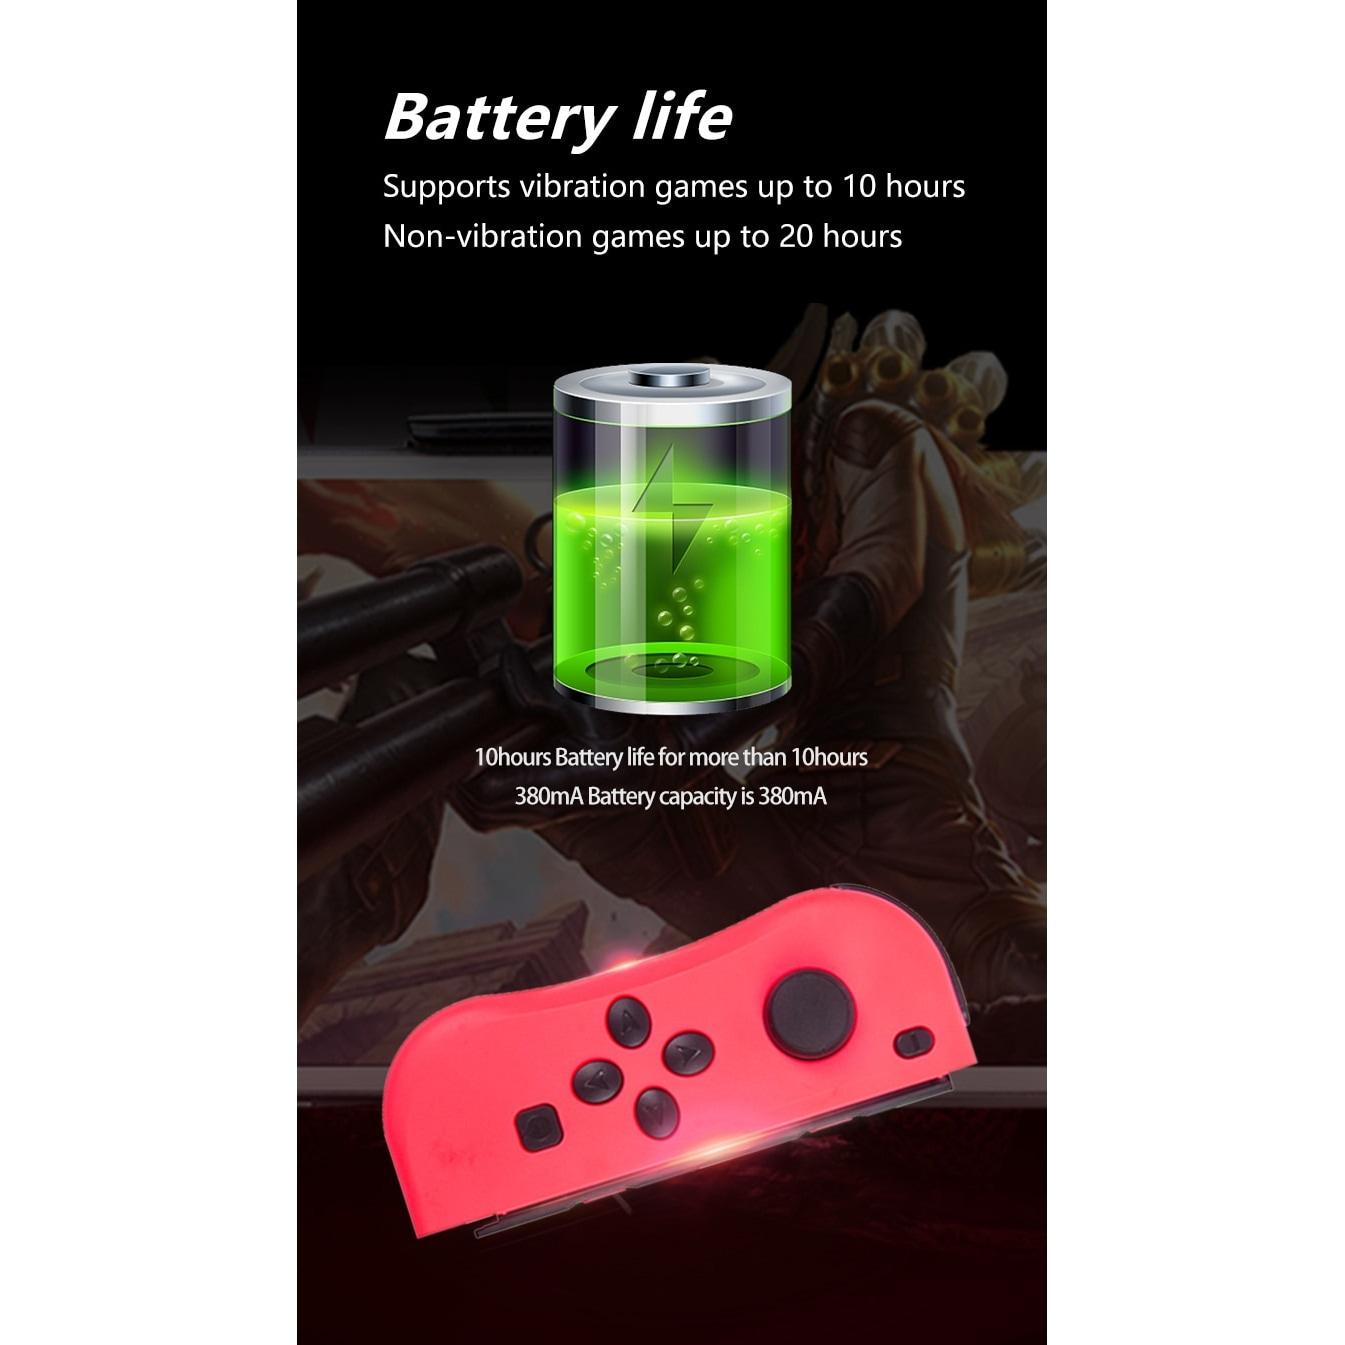 Wireless Joysticks for Nintendo Switch (L and R) Cyan - 4